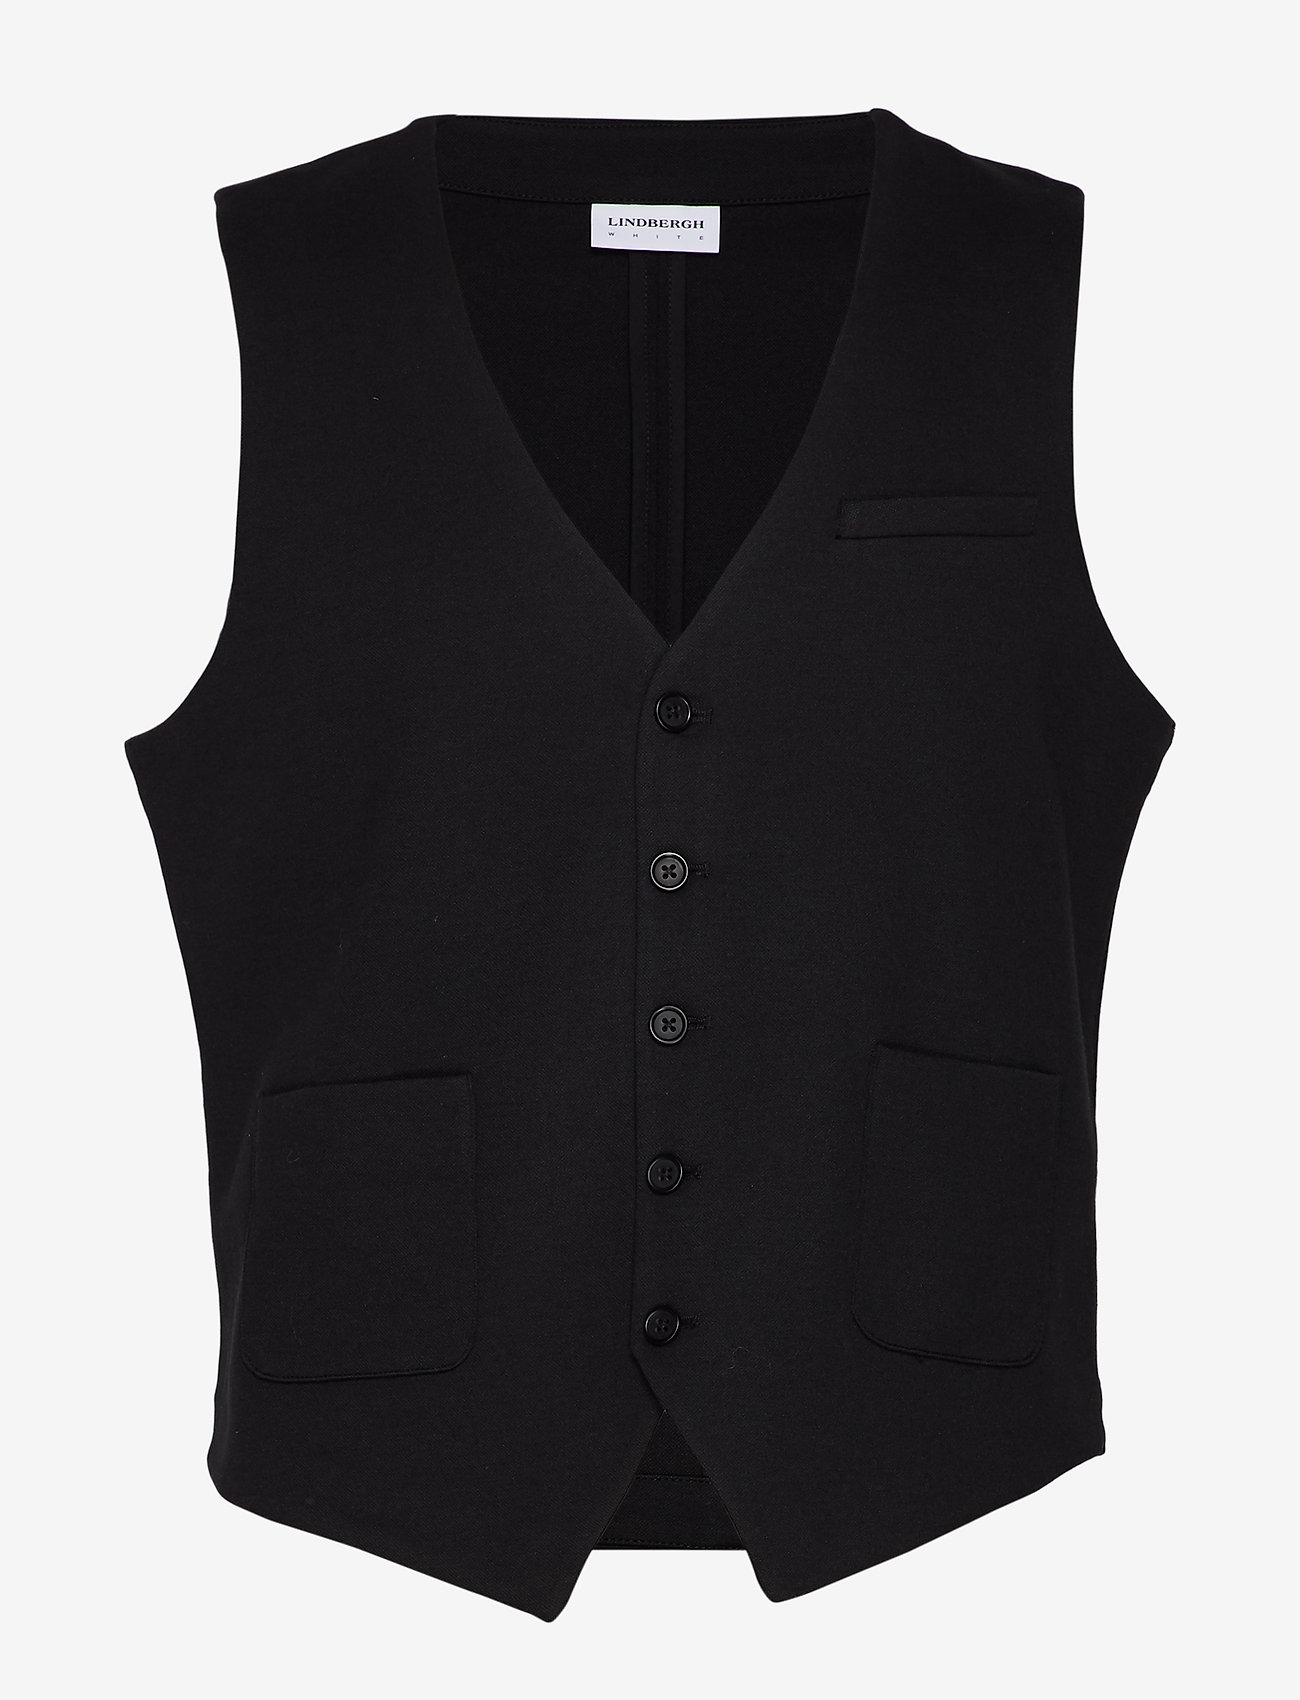 Lindbergh - Knitted waistcoat - waistcoats - black - 1